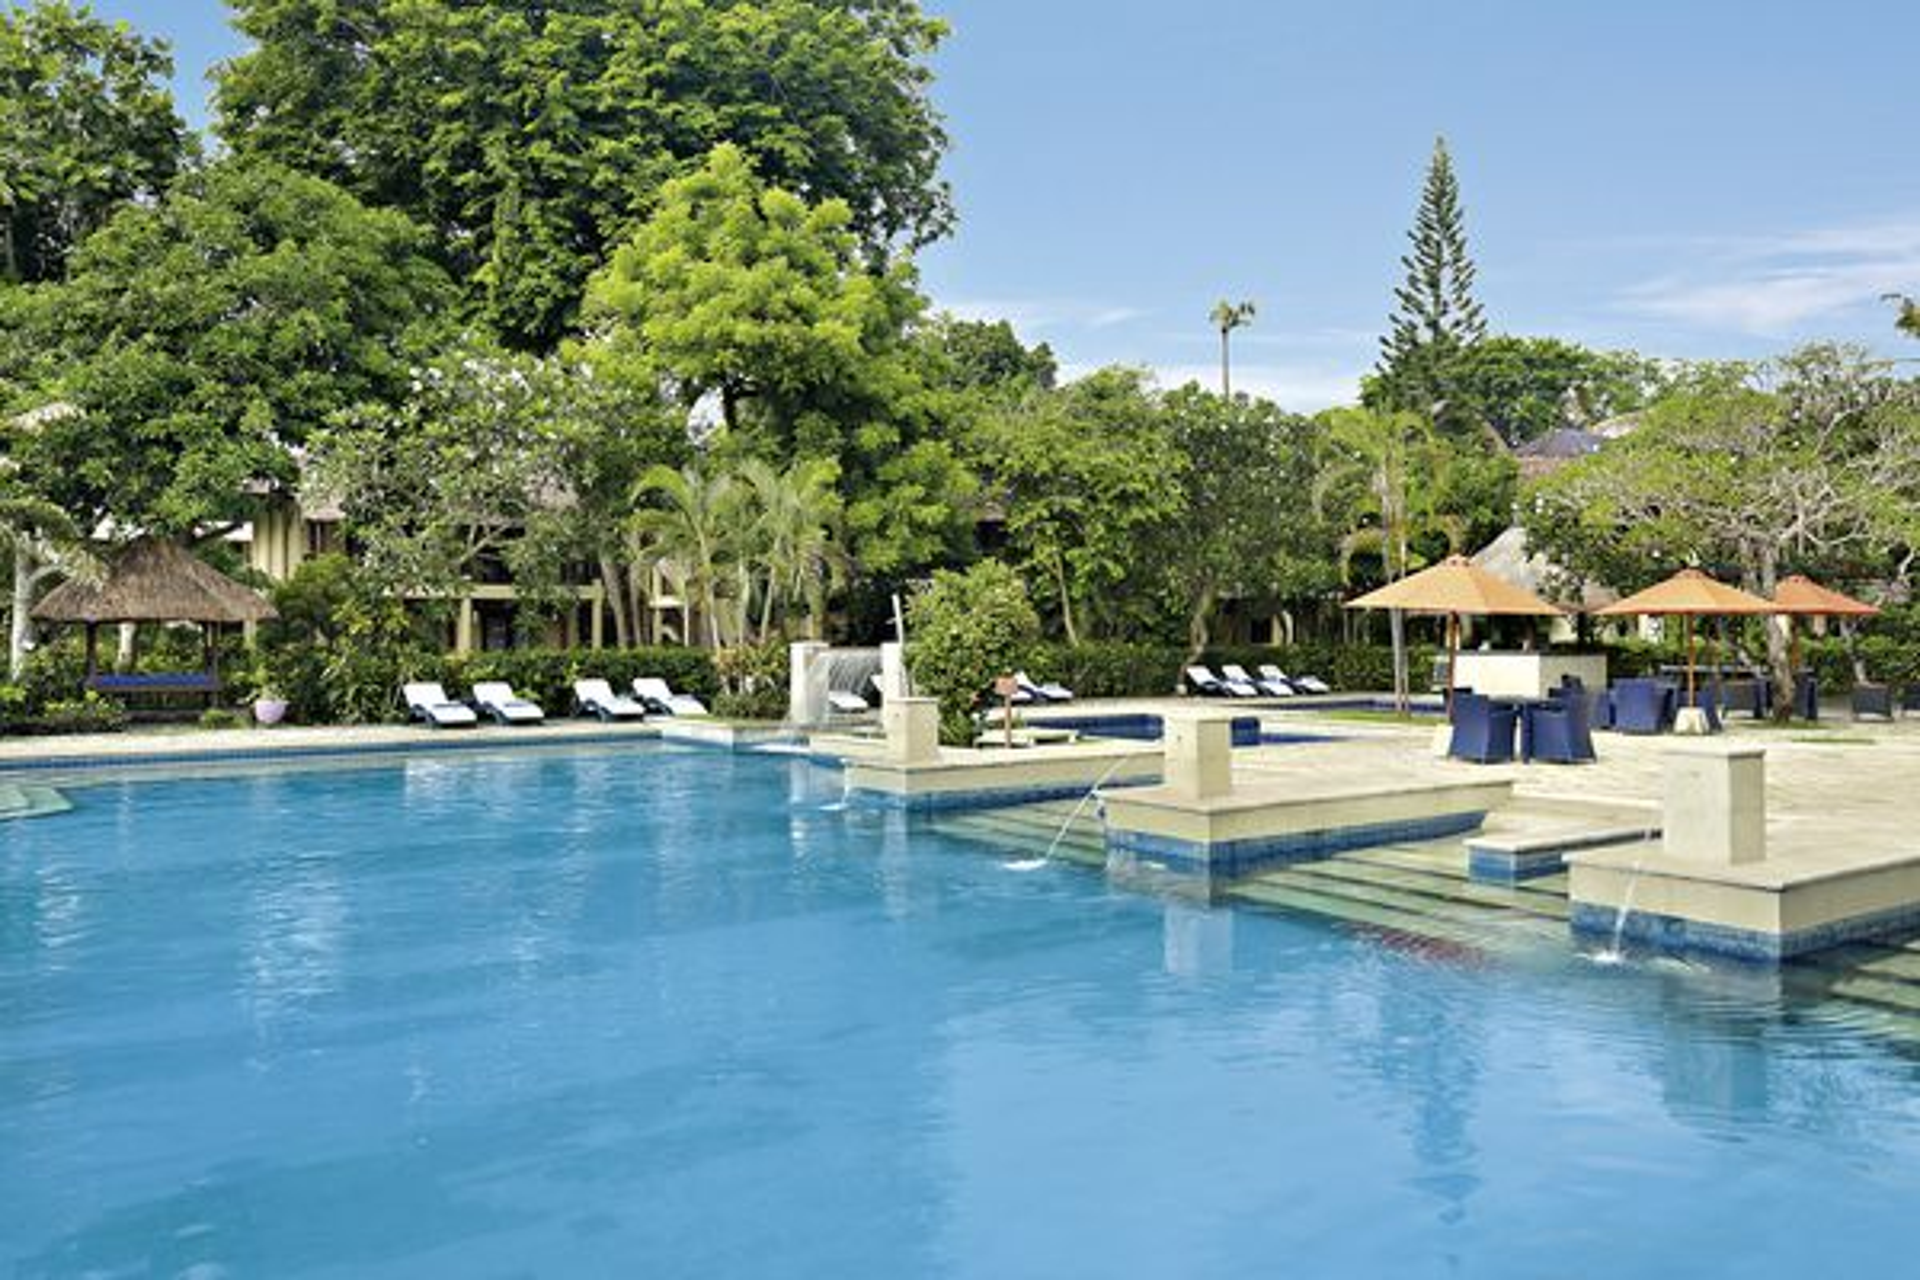 Bali - Indonésie - Hôtel Mercure Resort Sanur 4*